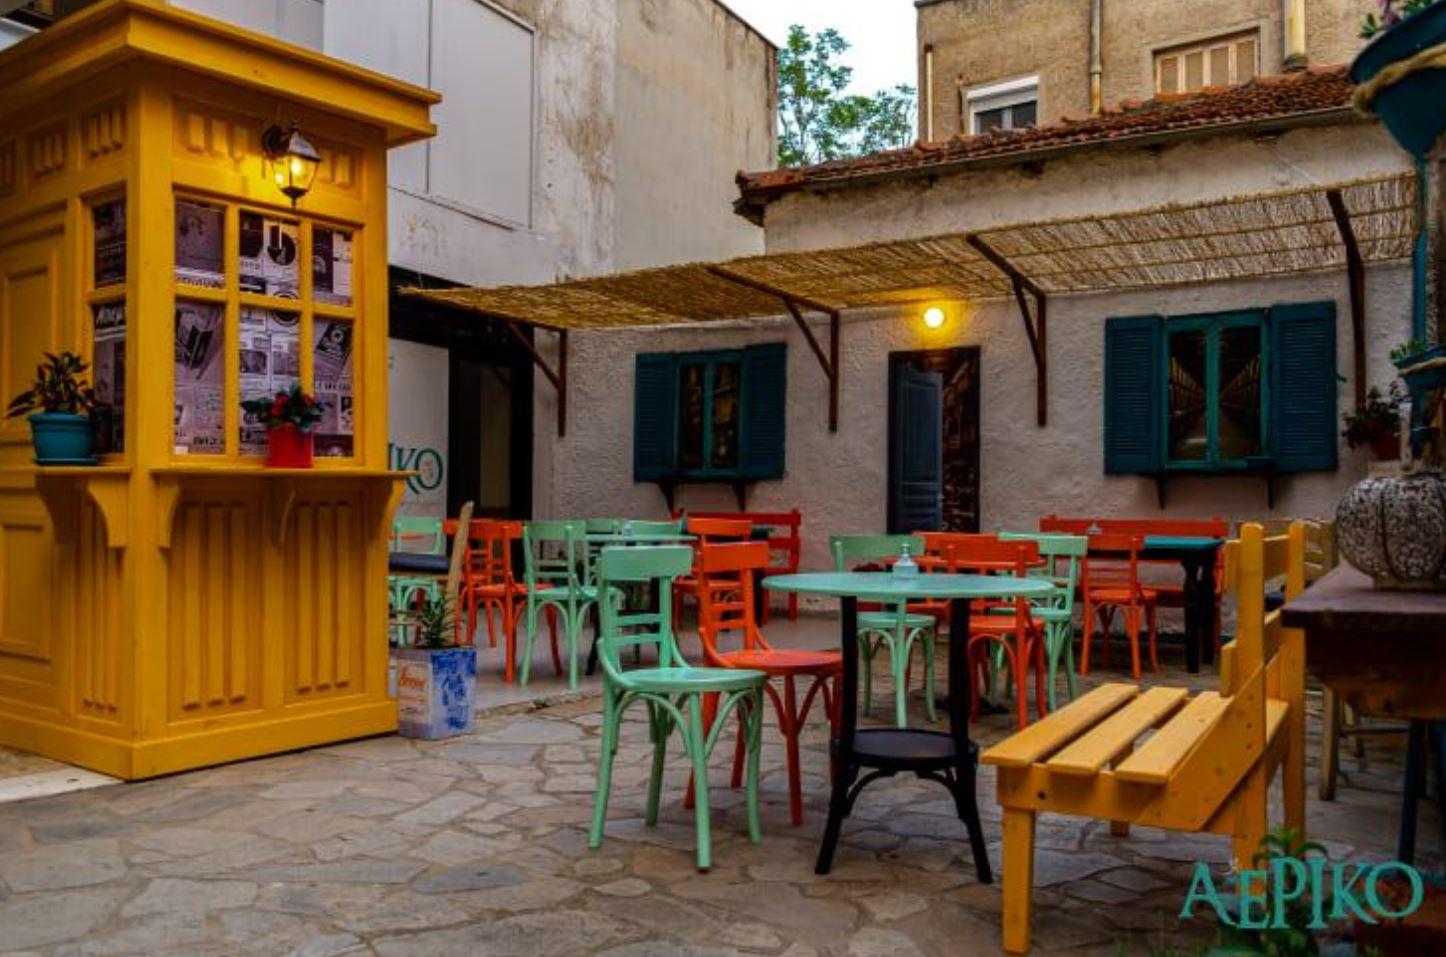 Koζάνη: Καφέ – μπαρ – Μεζεδοπωλείο Αερικό Ωριγένους 5 (Στοά) – Ανοίγουμε τη Δευτέρα 10 Μαΐου